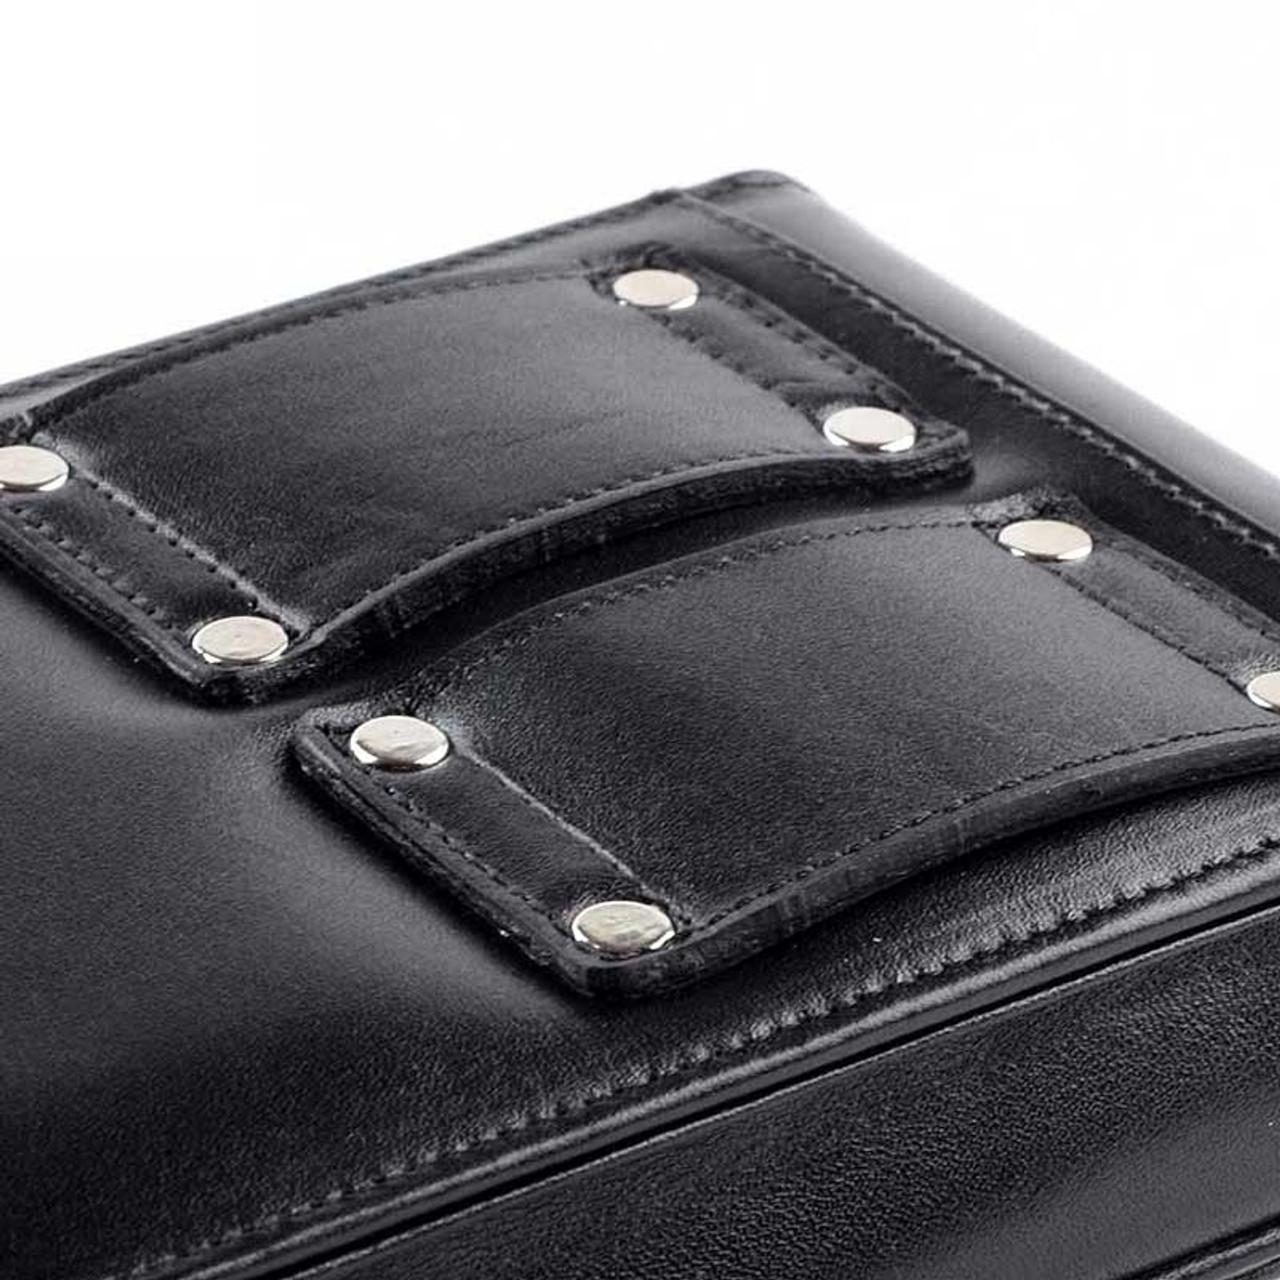 Springfield XD40sc Concealed Carry Holster (Belt Loop)